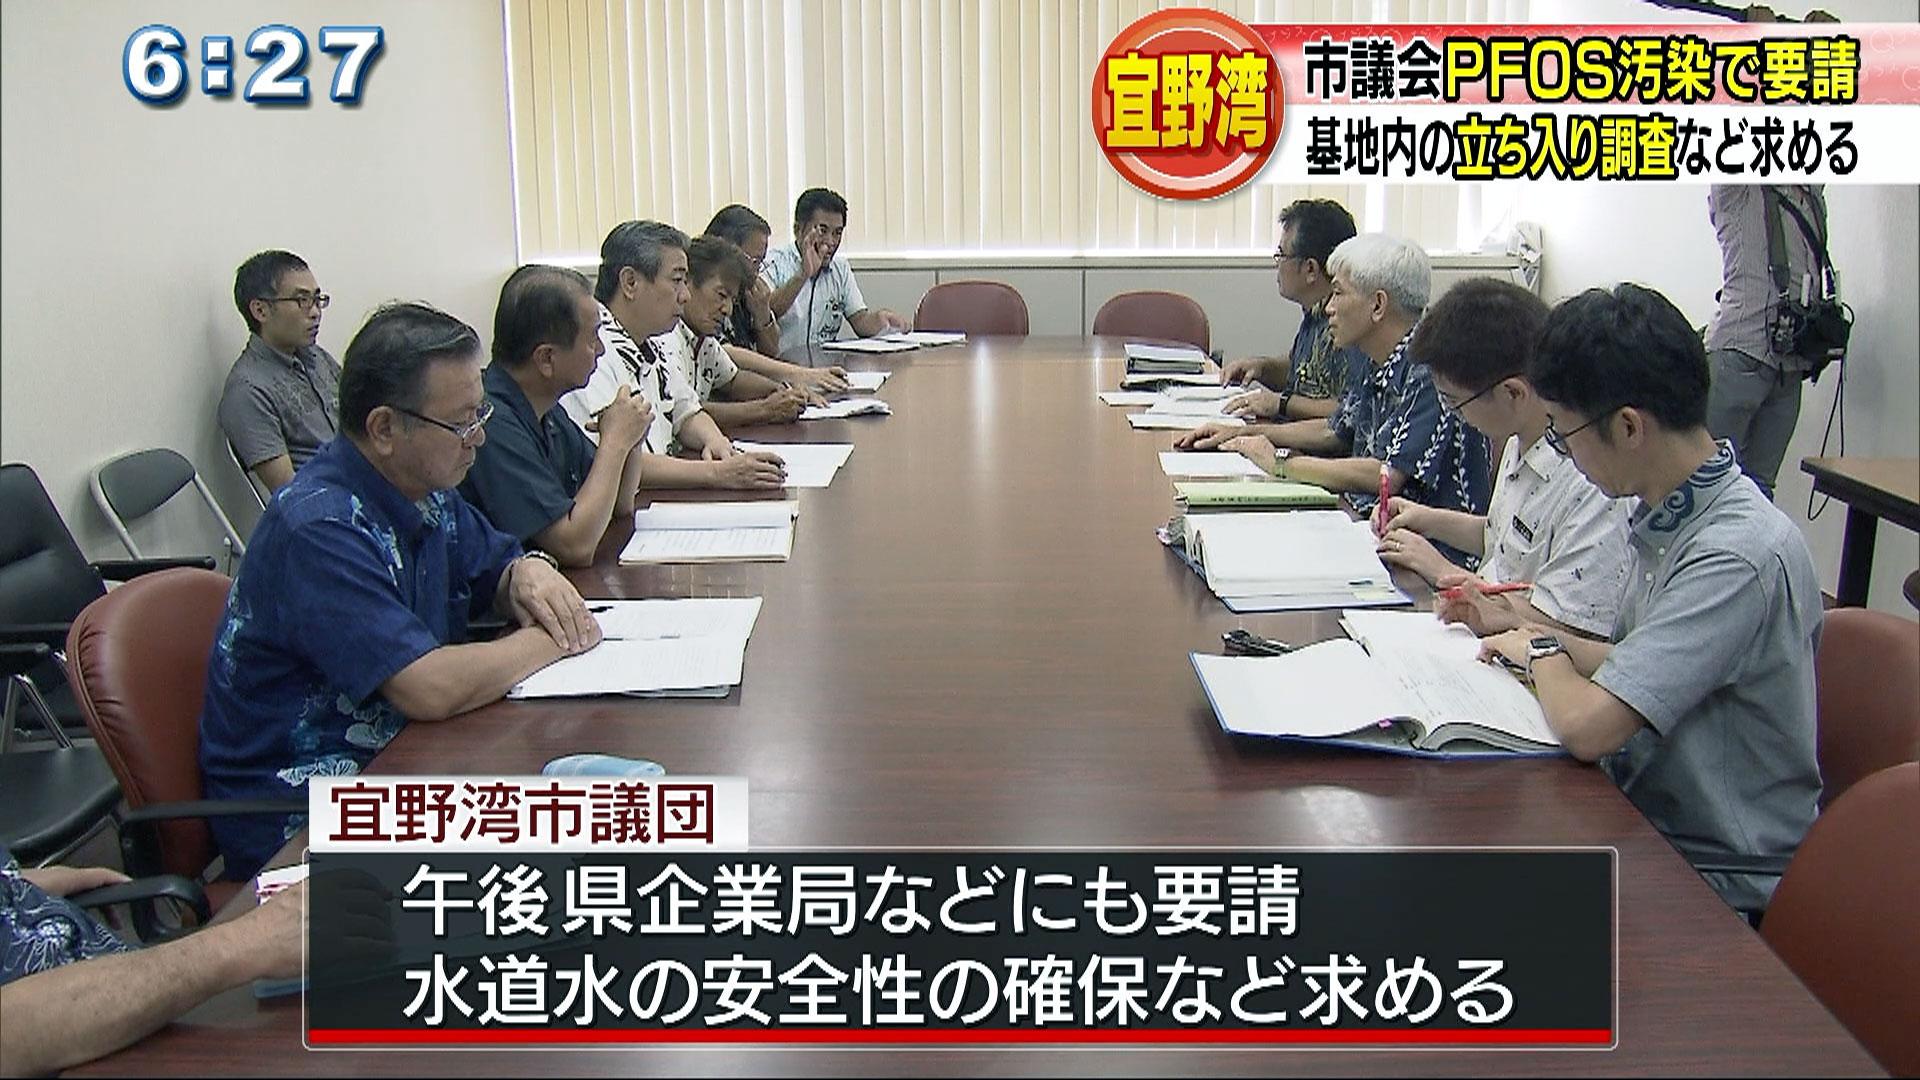 PFOS問題で宜野湾市議会が要請